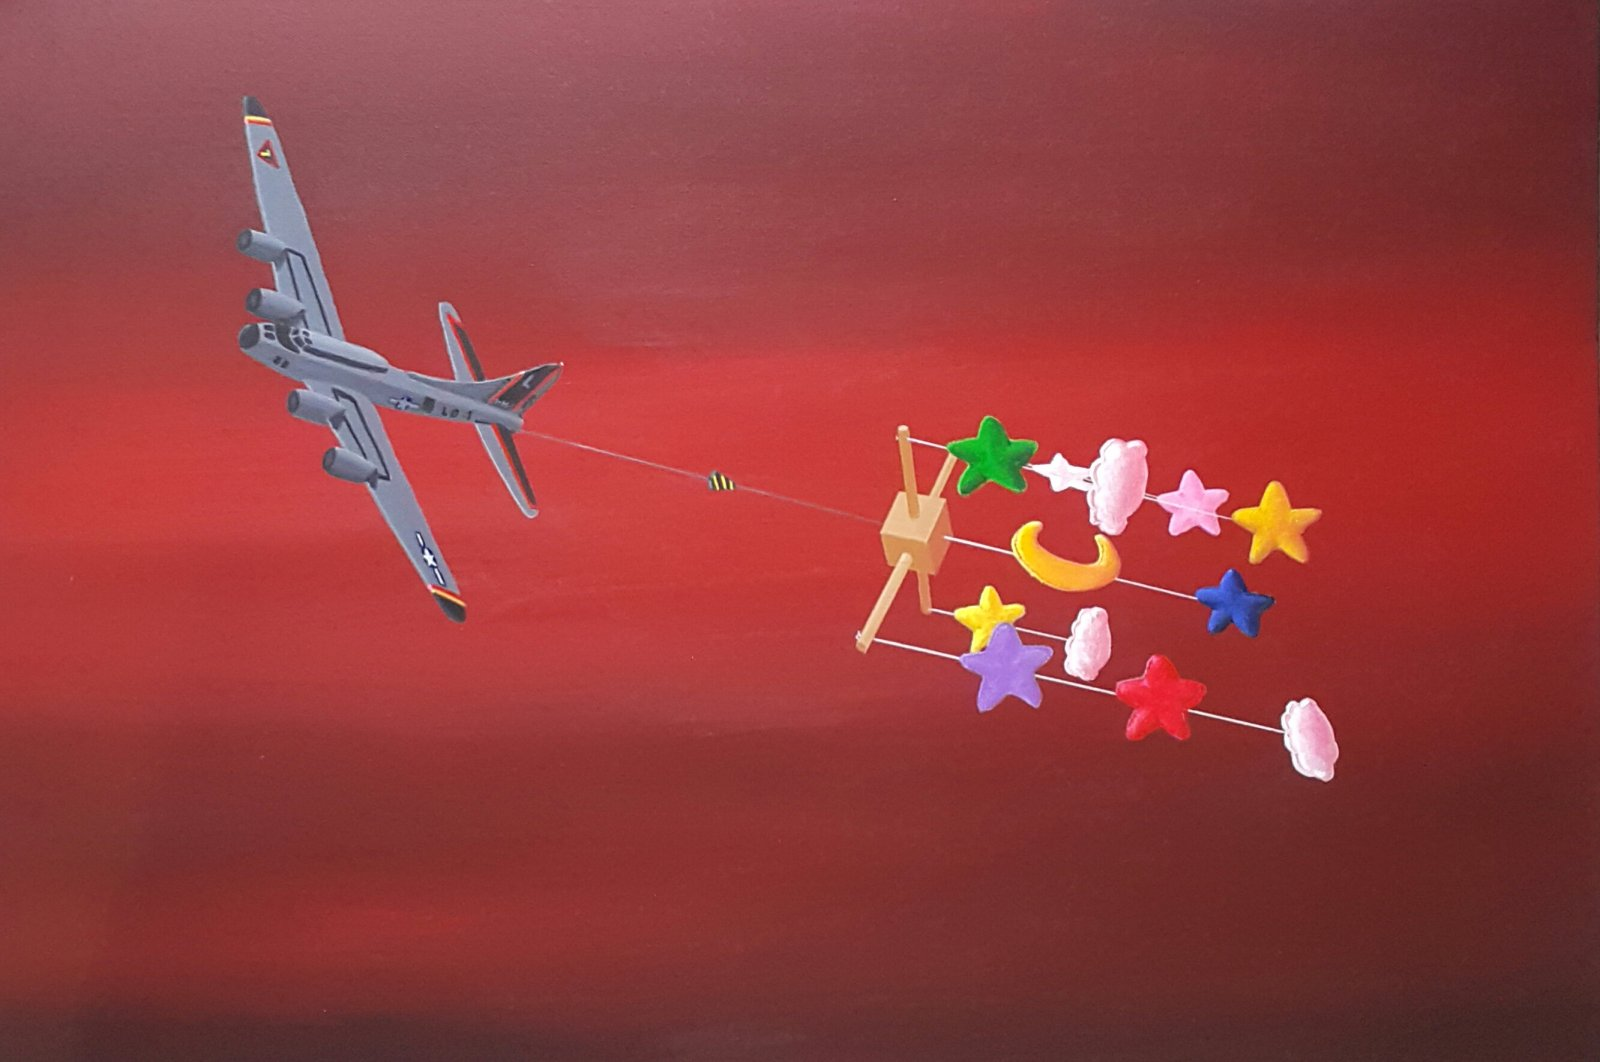 "Serkan Küçüközcü, ""Red Plane"", acrylic on canvas, 50 by 70 centimeters, 2019. (Courtesy of Anna Laudel Gallery)"